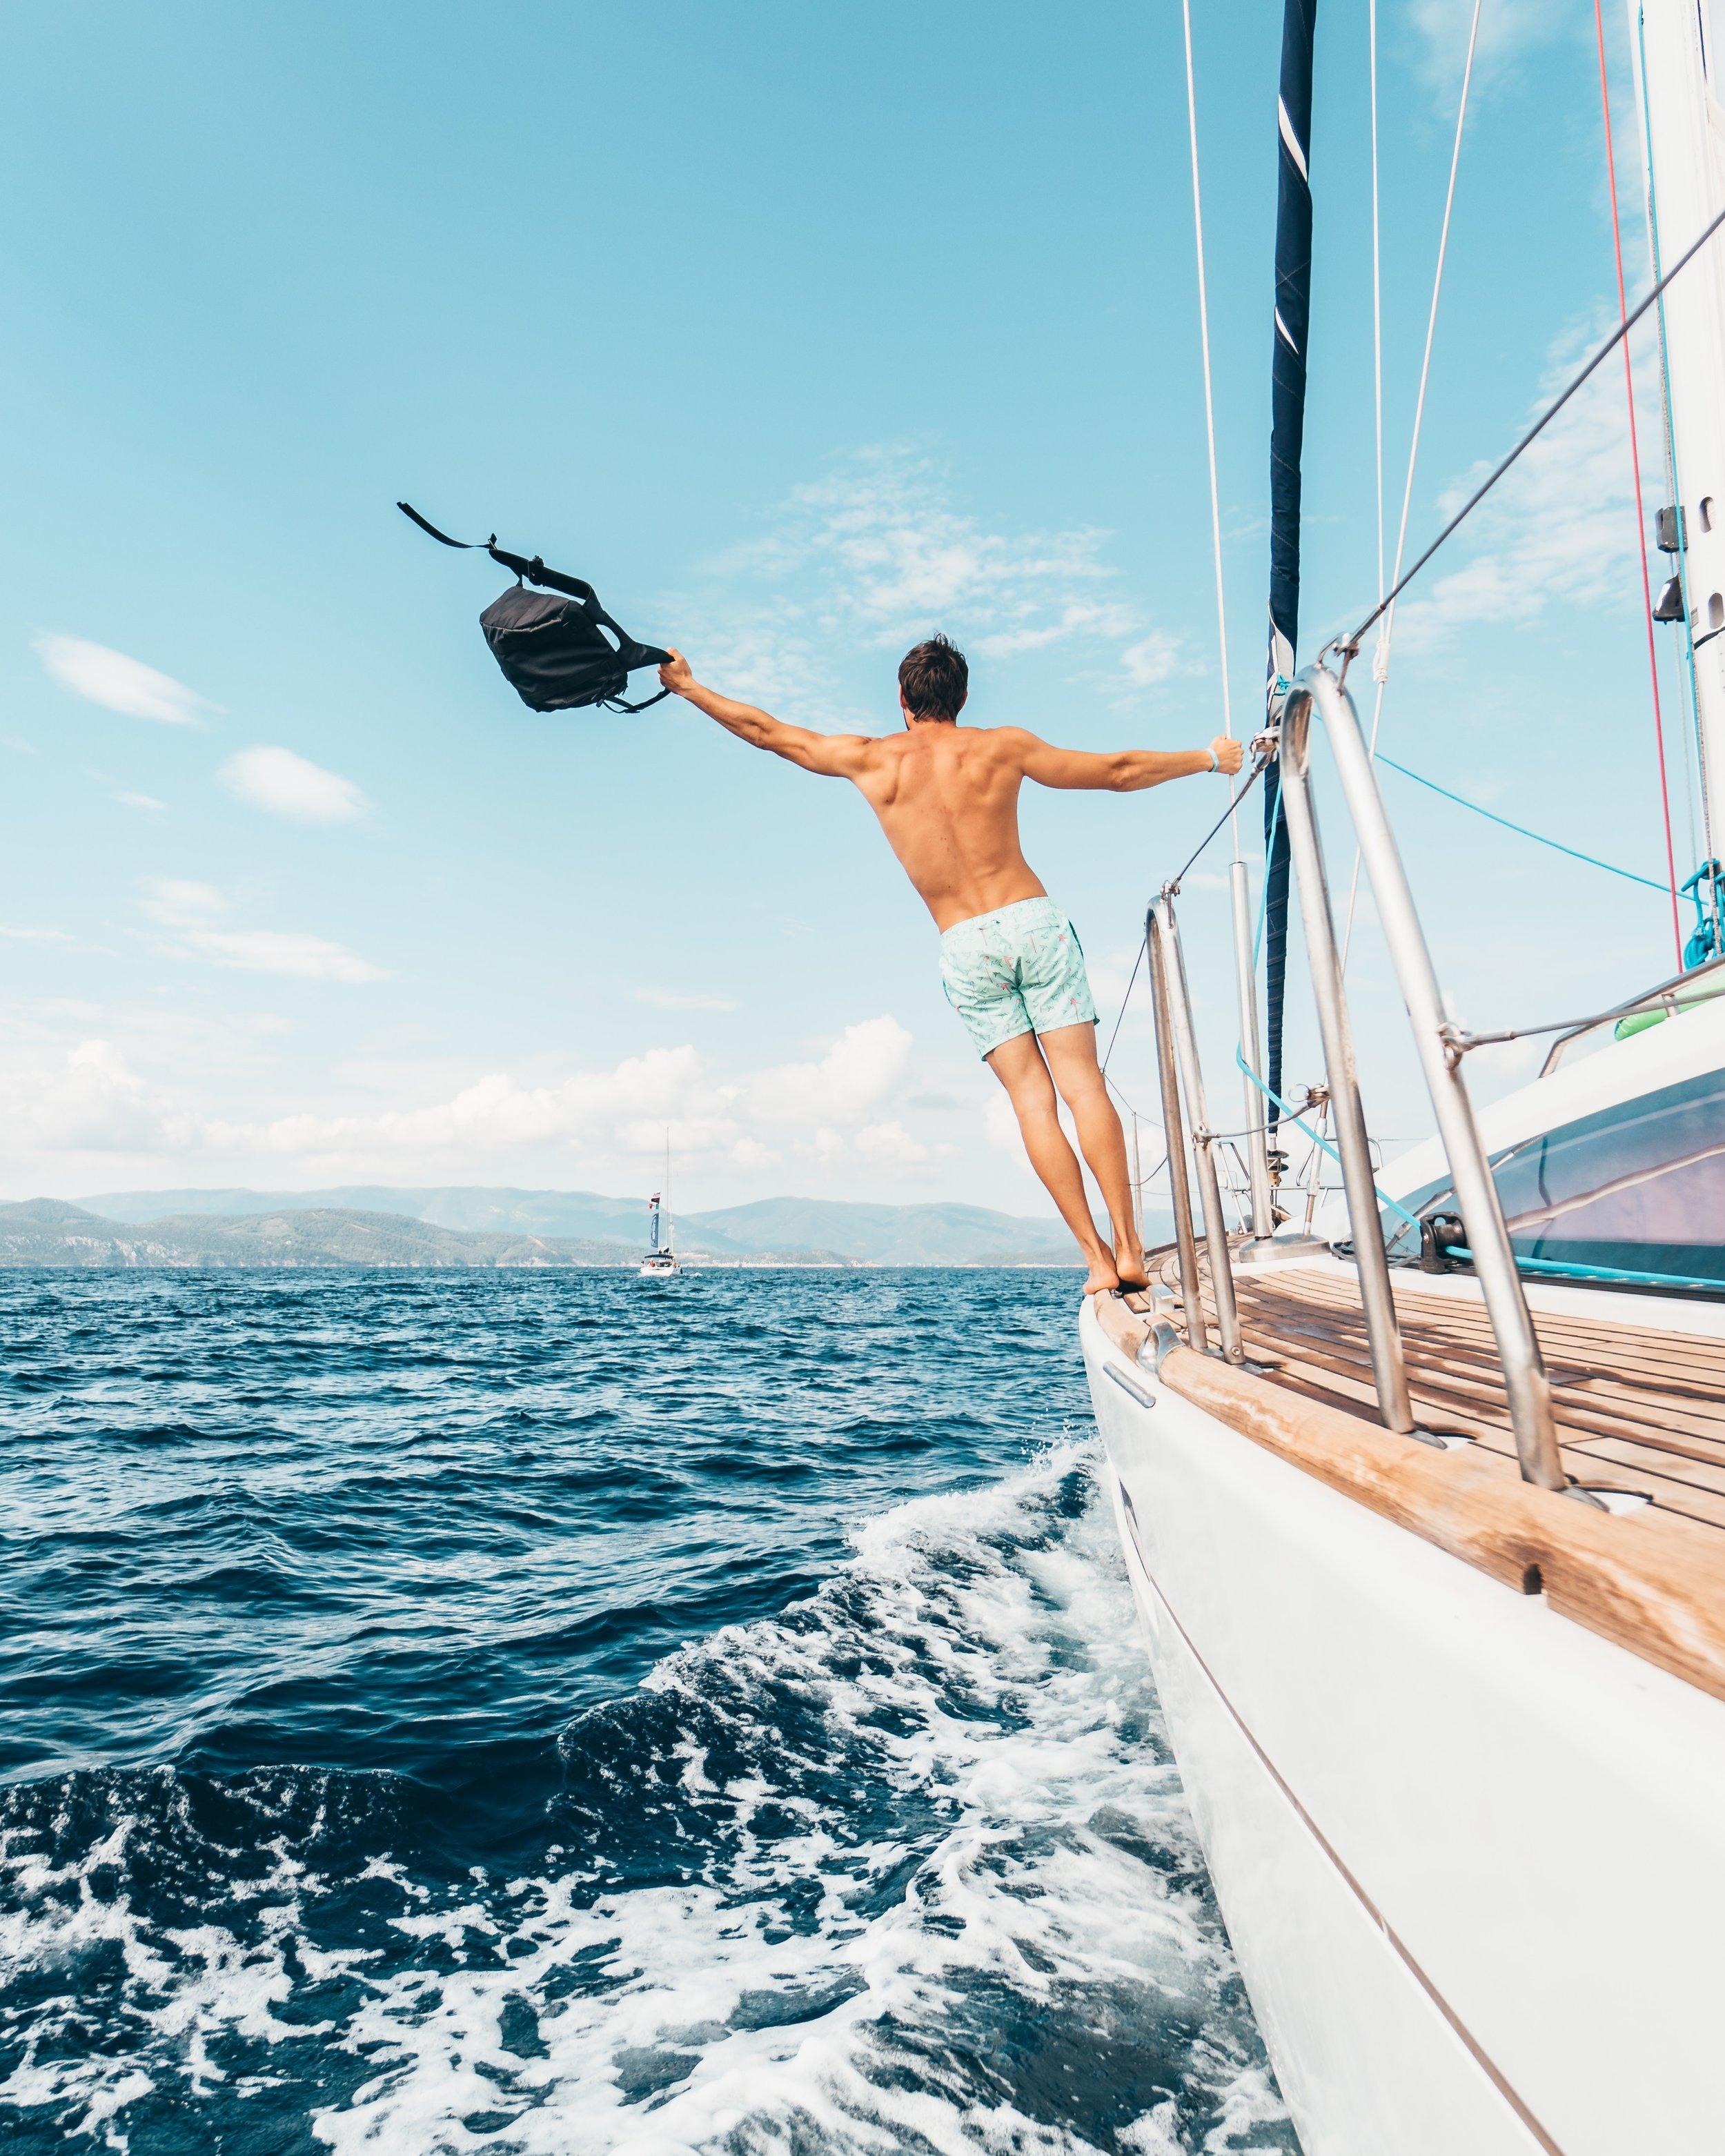 adventure-boat-freedom-1223649 (1).jpg